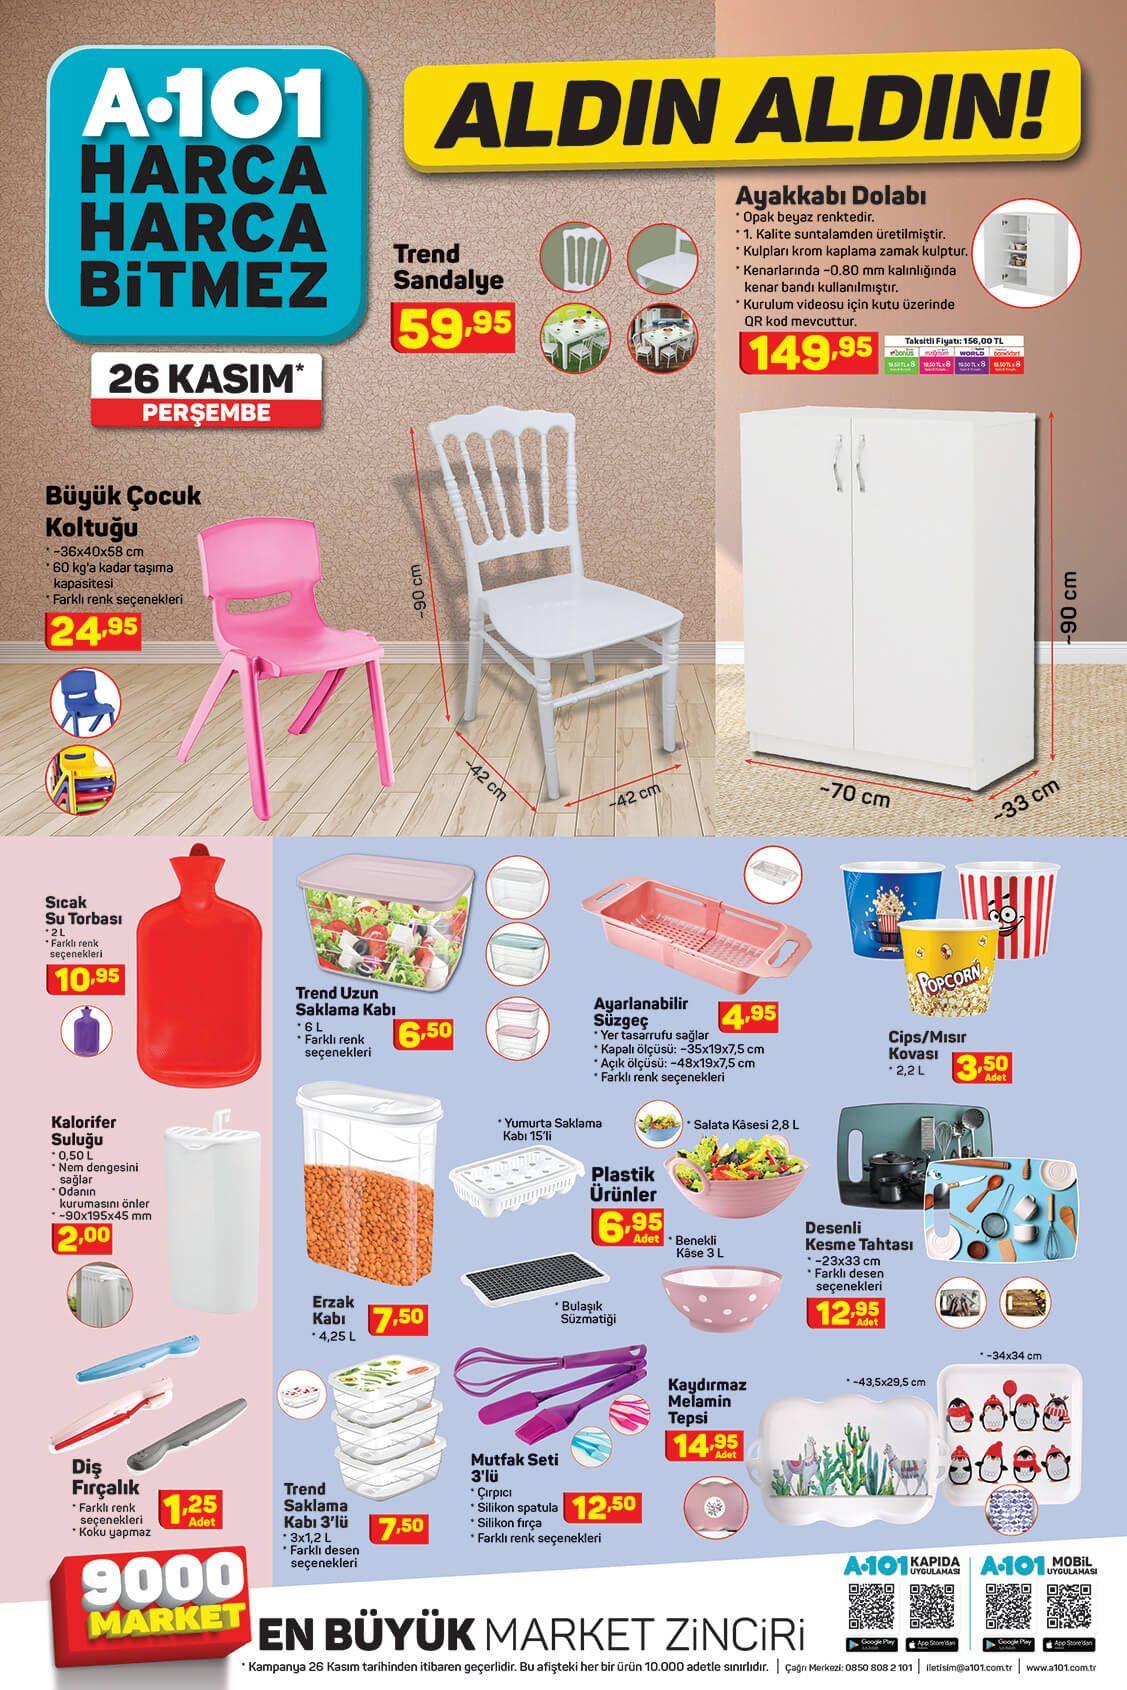 A101-Bu-Hafta-Katalog-Urunleri-26-Kasim-2020-Persembe-Gorseli-Up